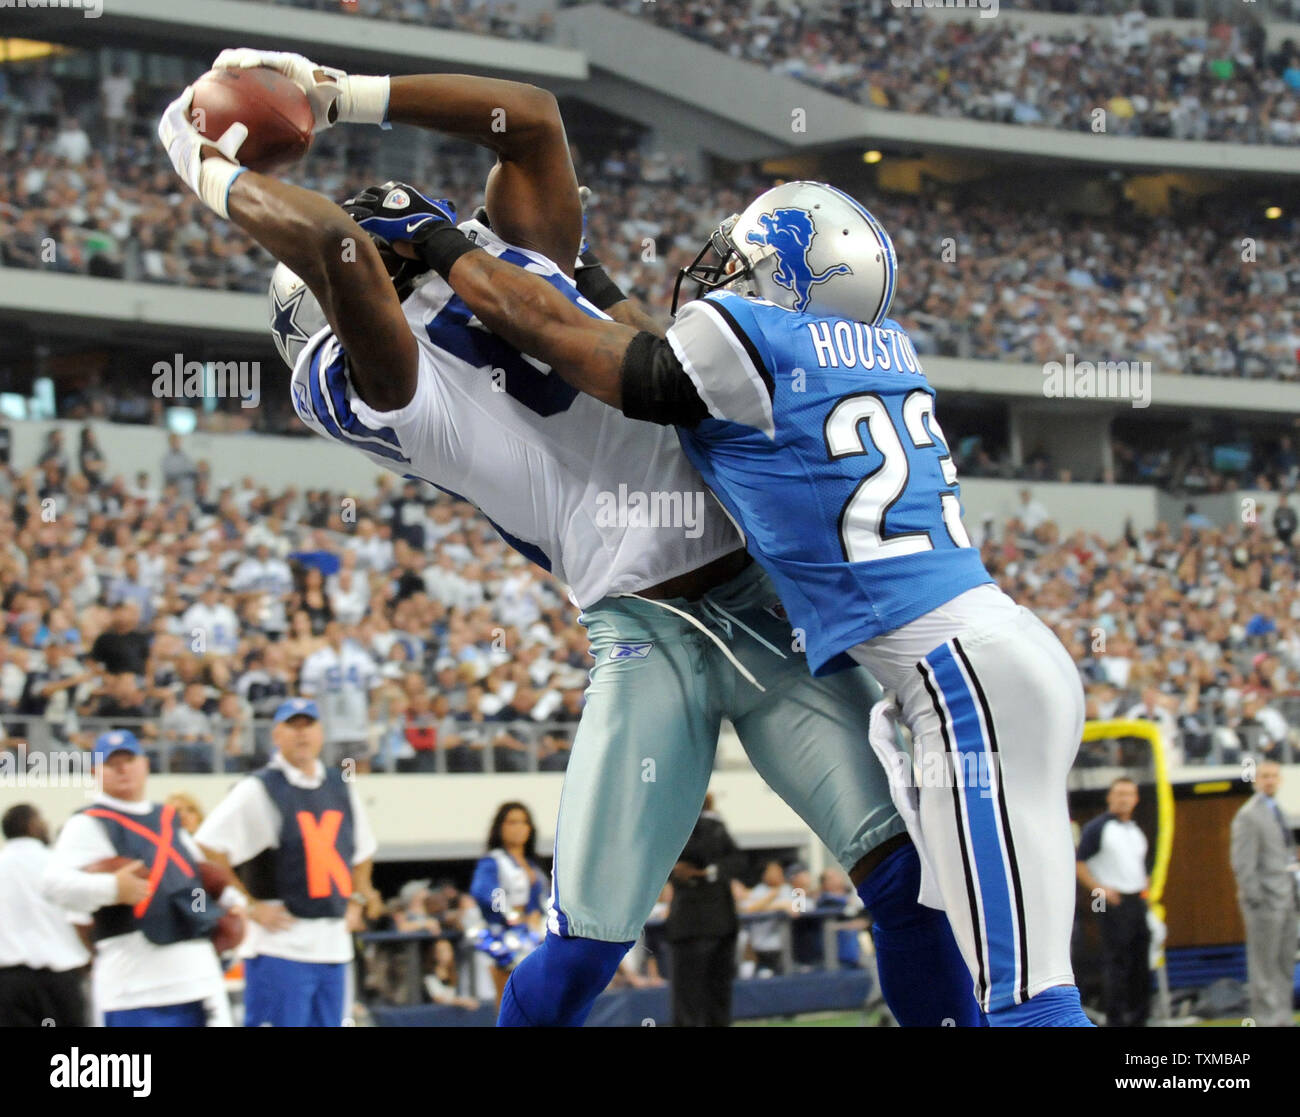 Dallas Cowboys Dez Bryant Makes A Catch For A Touchdown As